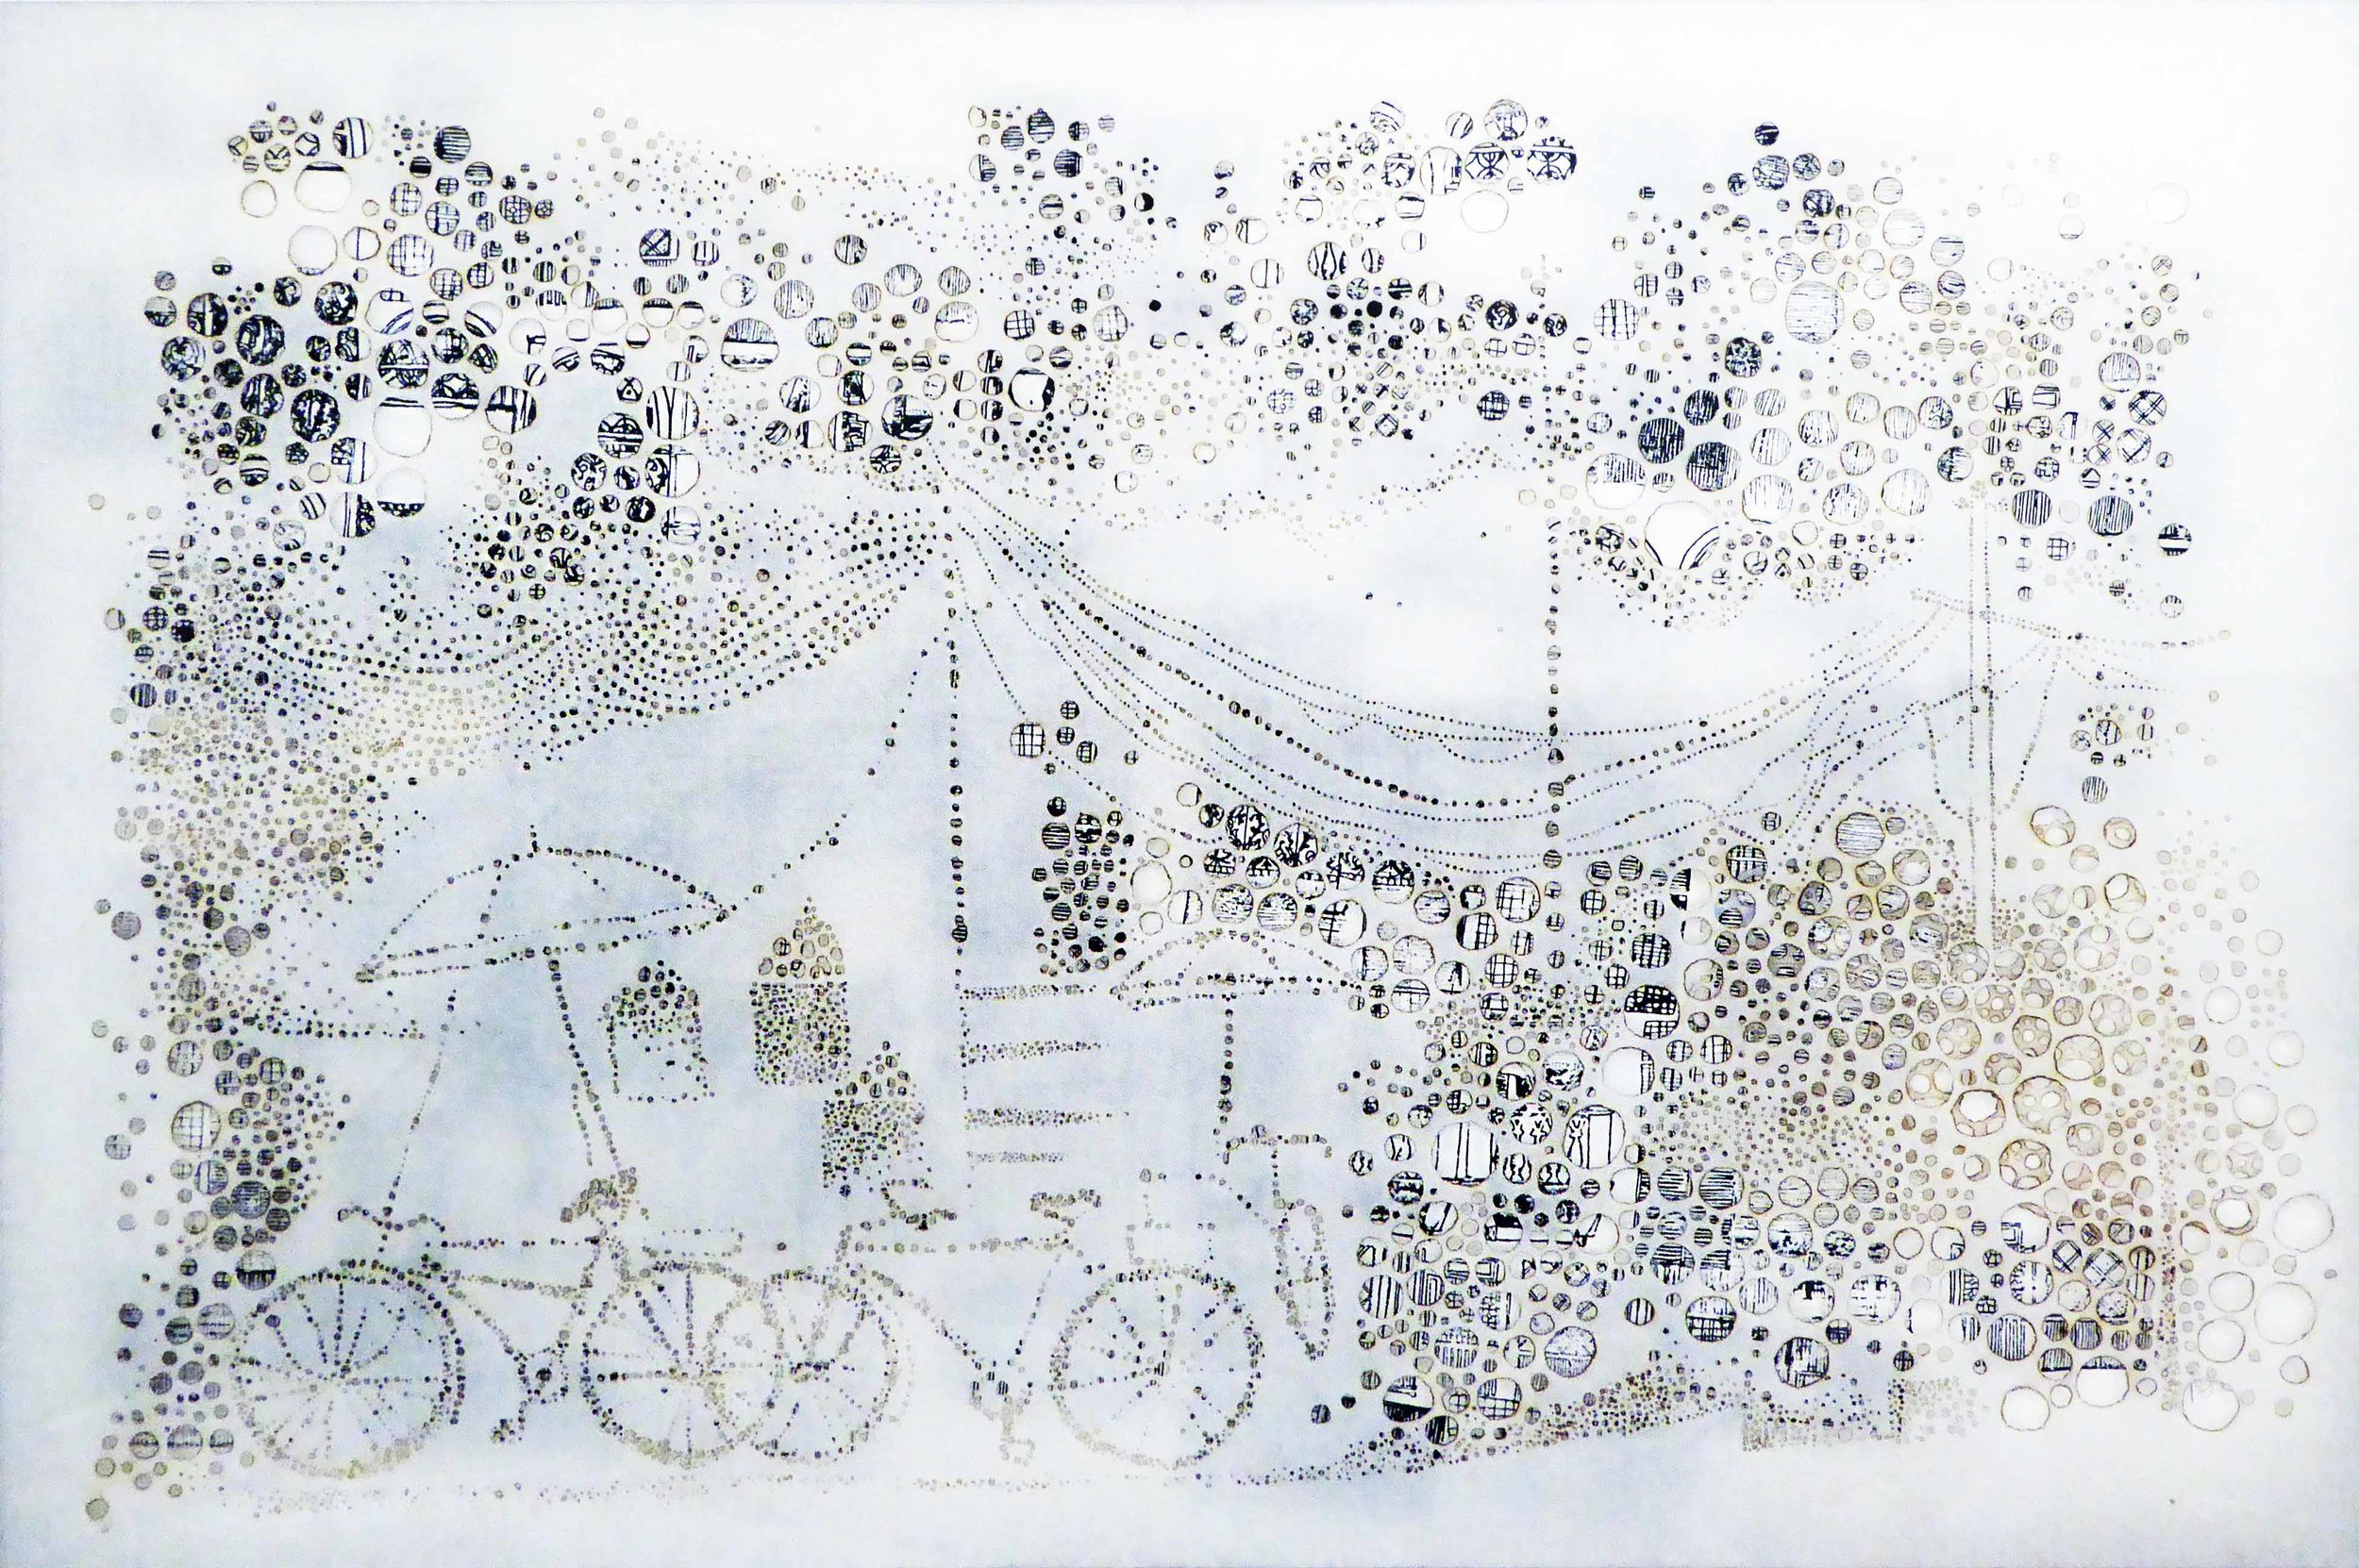 Intersection, Nicola Anthony, 2017